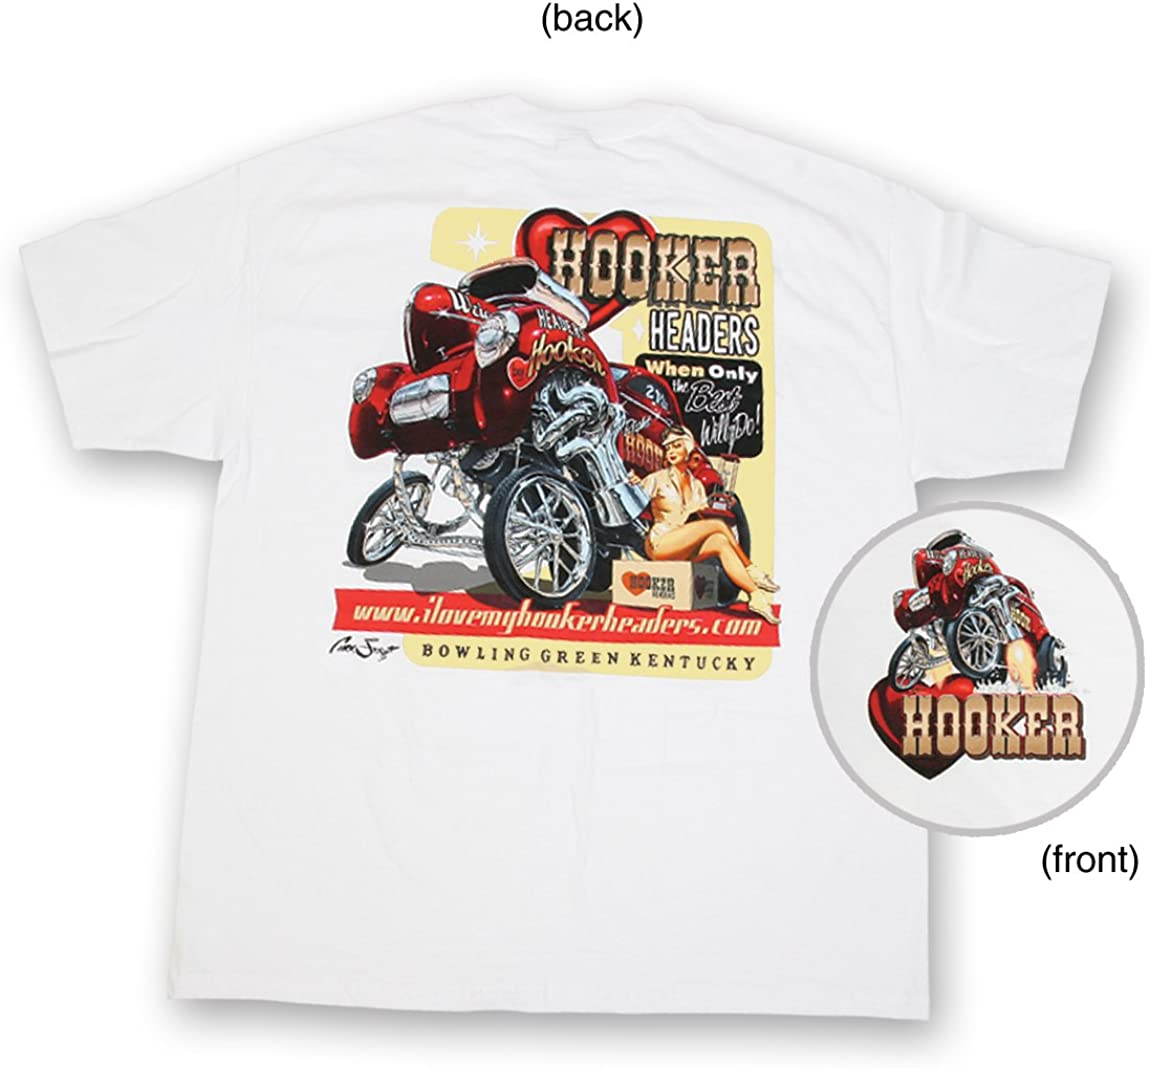 40-41 Willys Gasser T-Shirt Supercharged Gasser Mens T-Shirt By Hooker 10149HKR-Parent